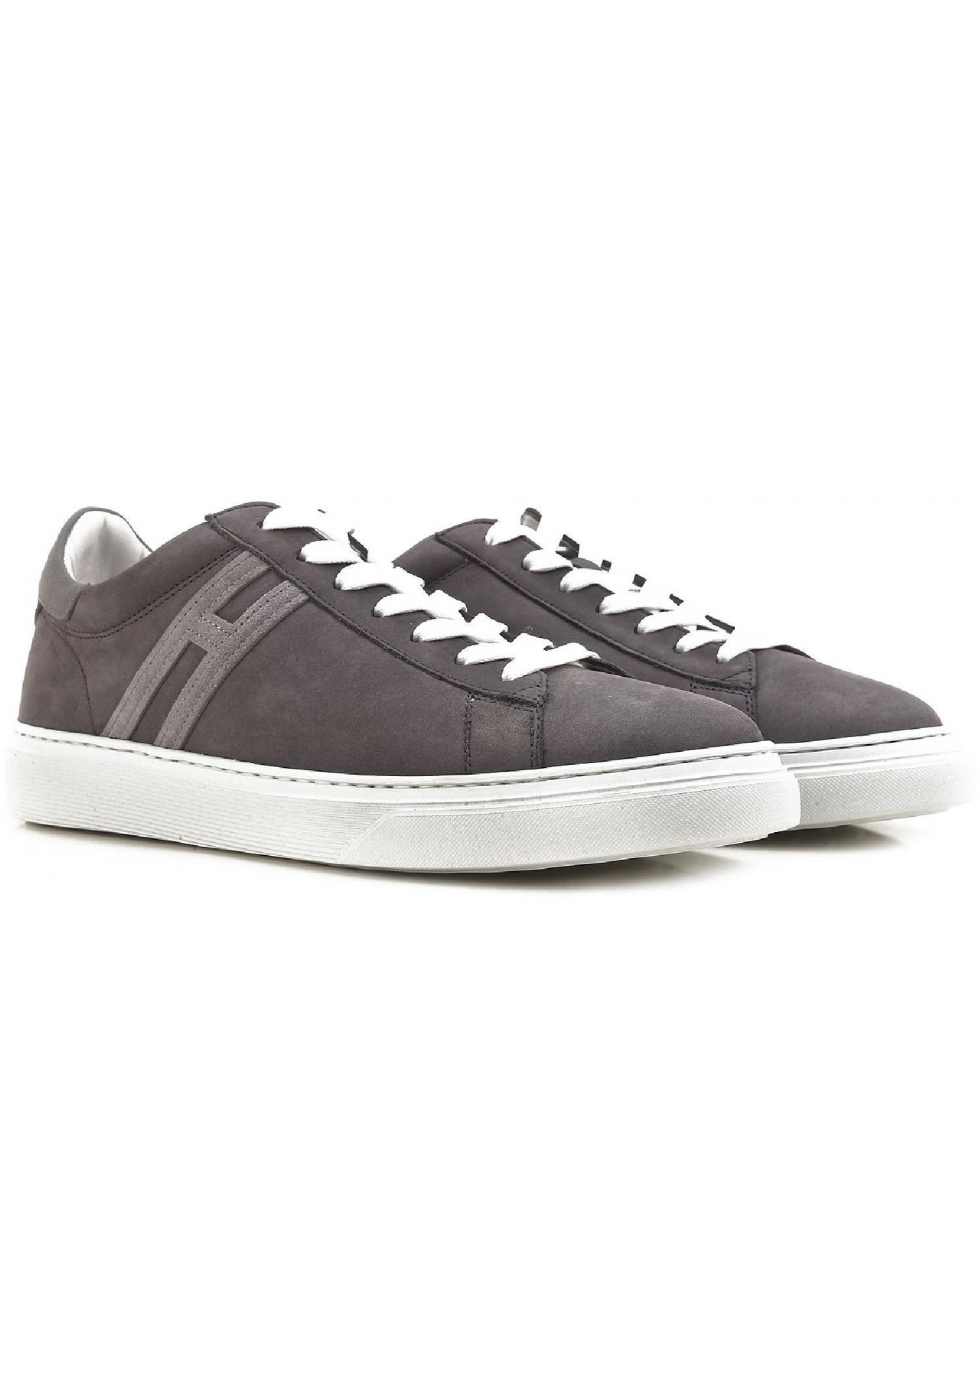 Hogan men's low top sneakers shoes in grey suede - Italian Boutique